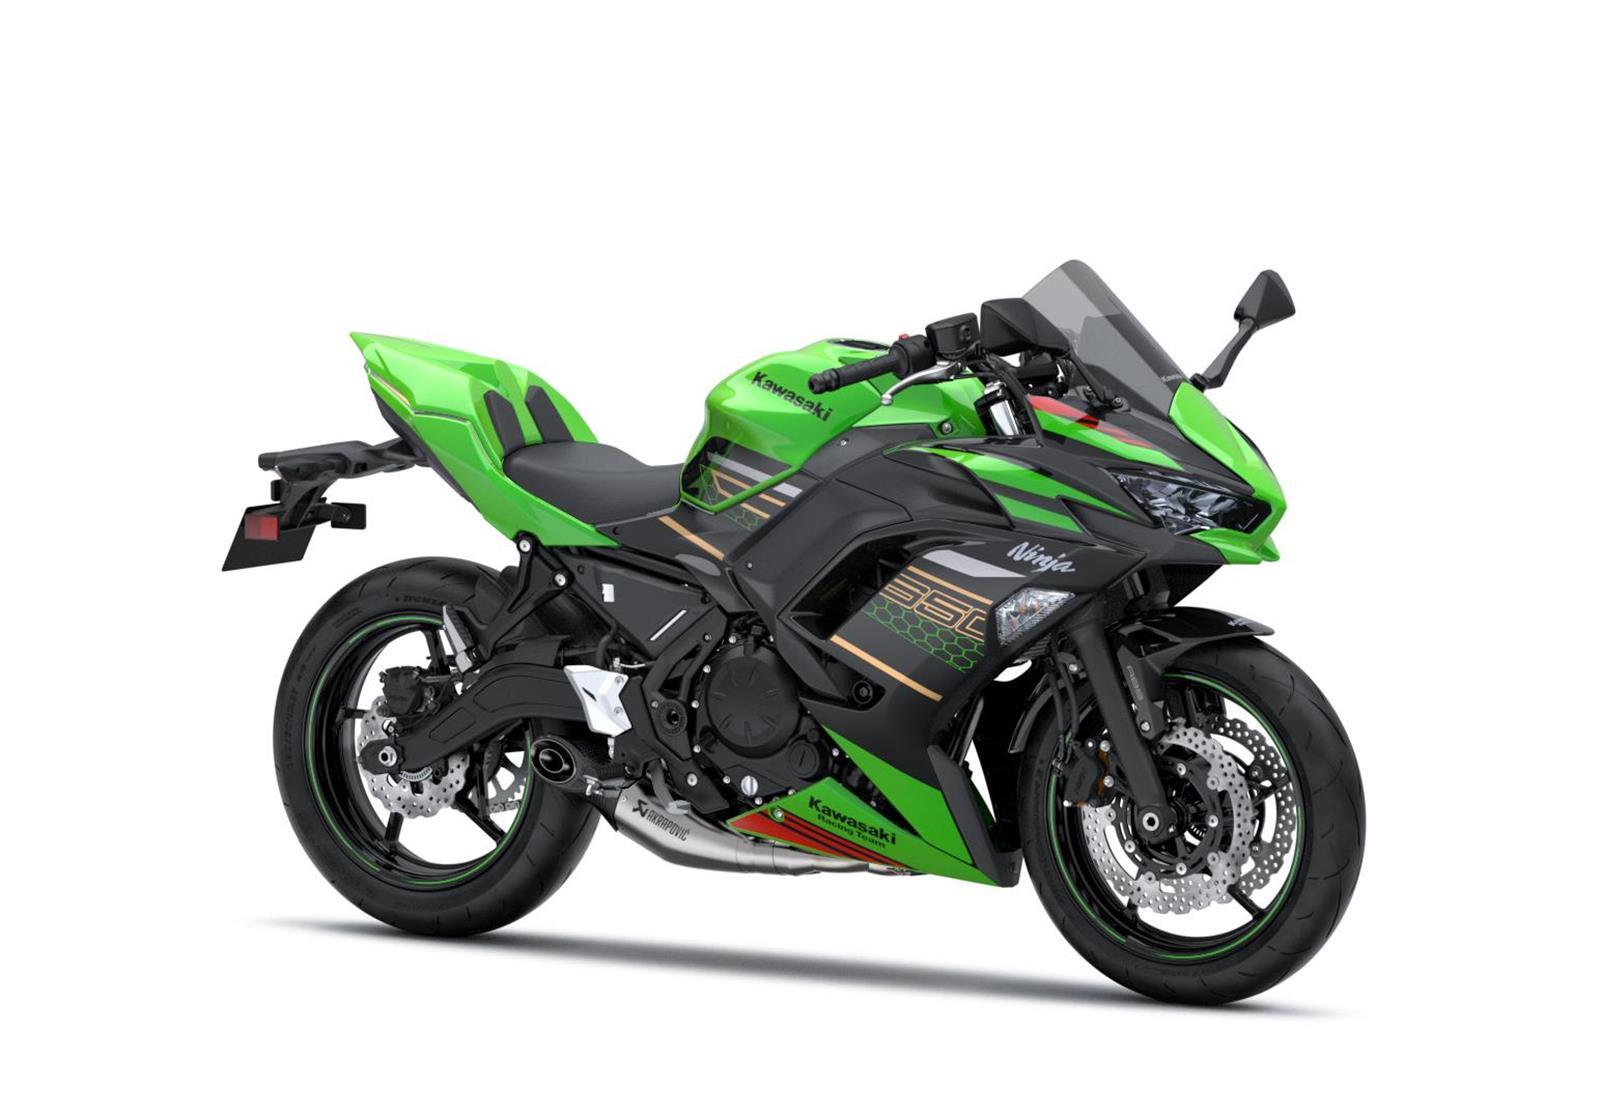 Ninja 650 Performance My 2020 Kawasaki Europe